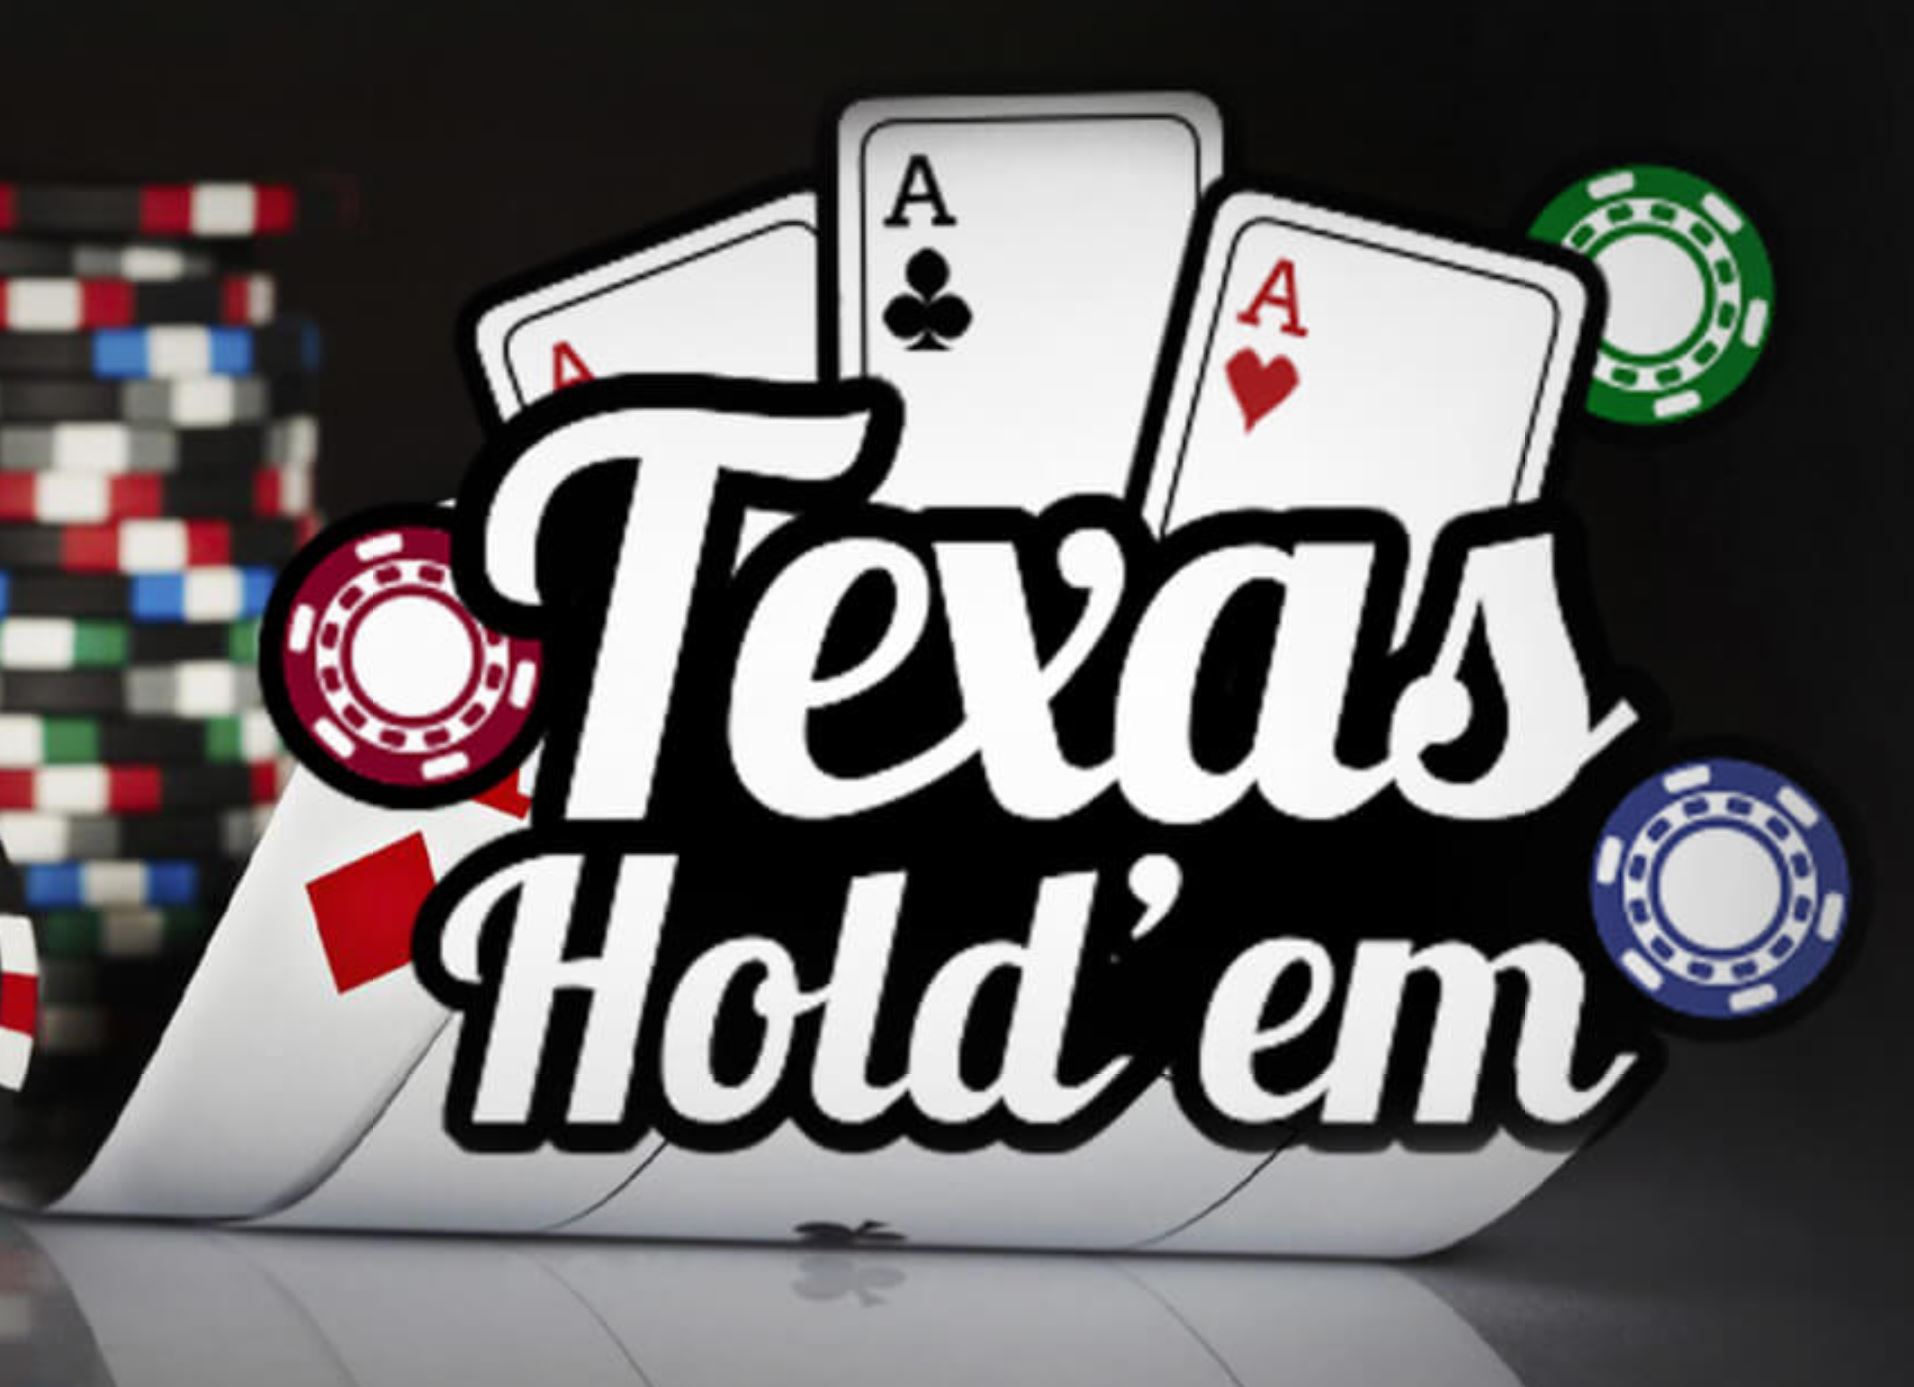 Texas Holdem Poker - A Few Tips